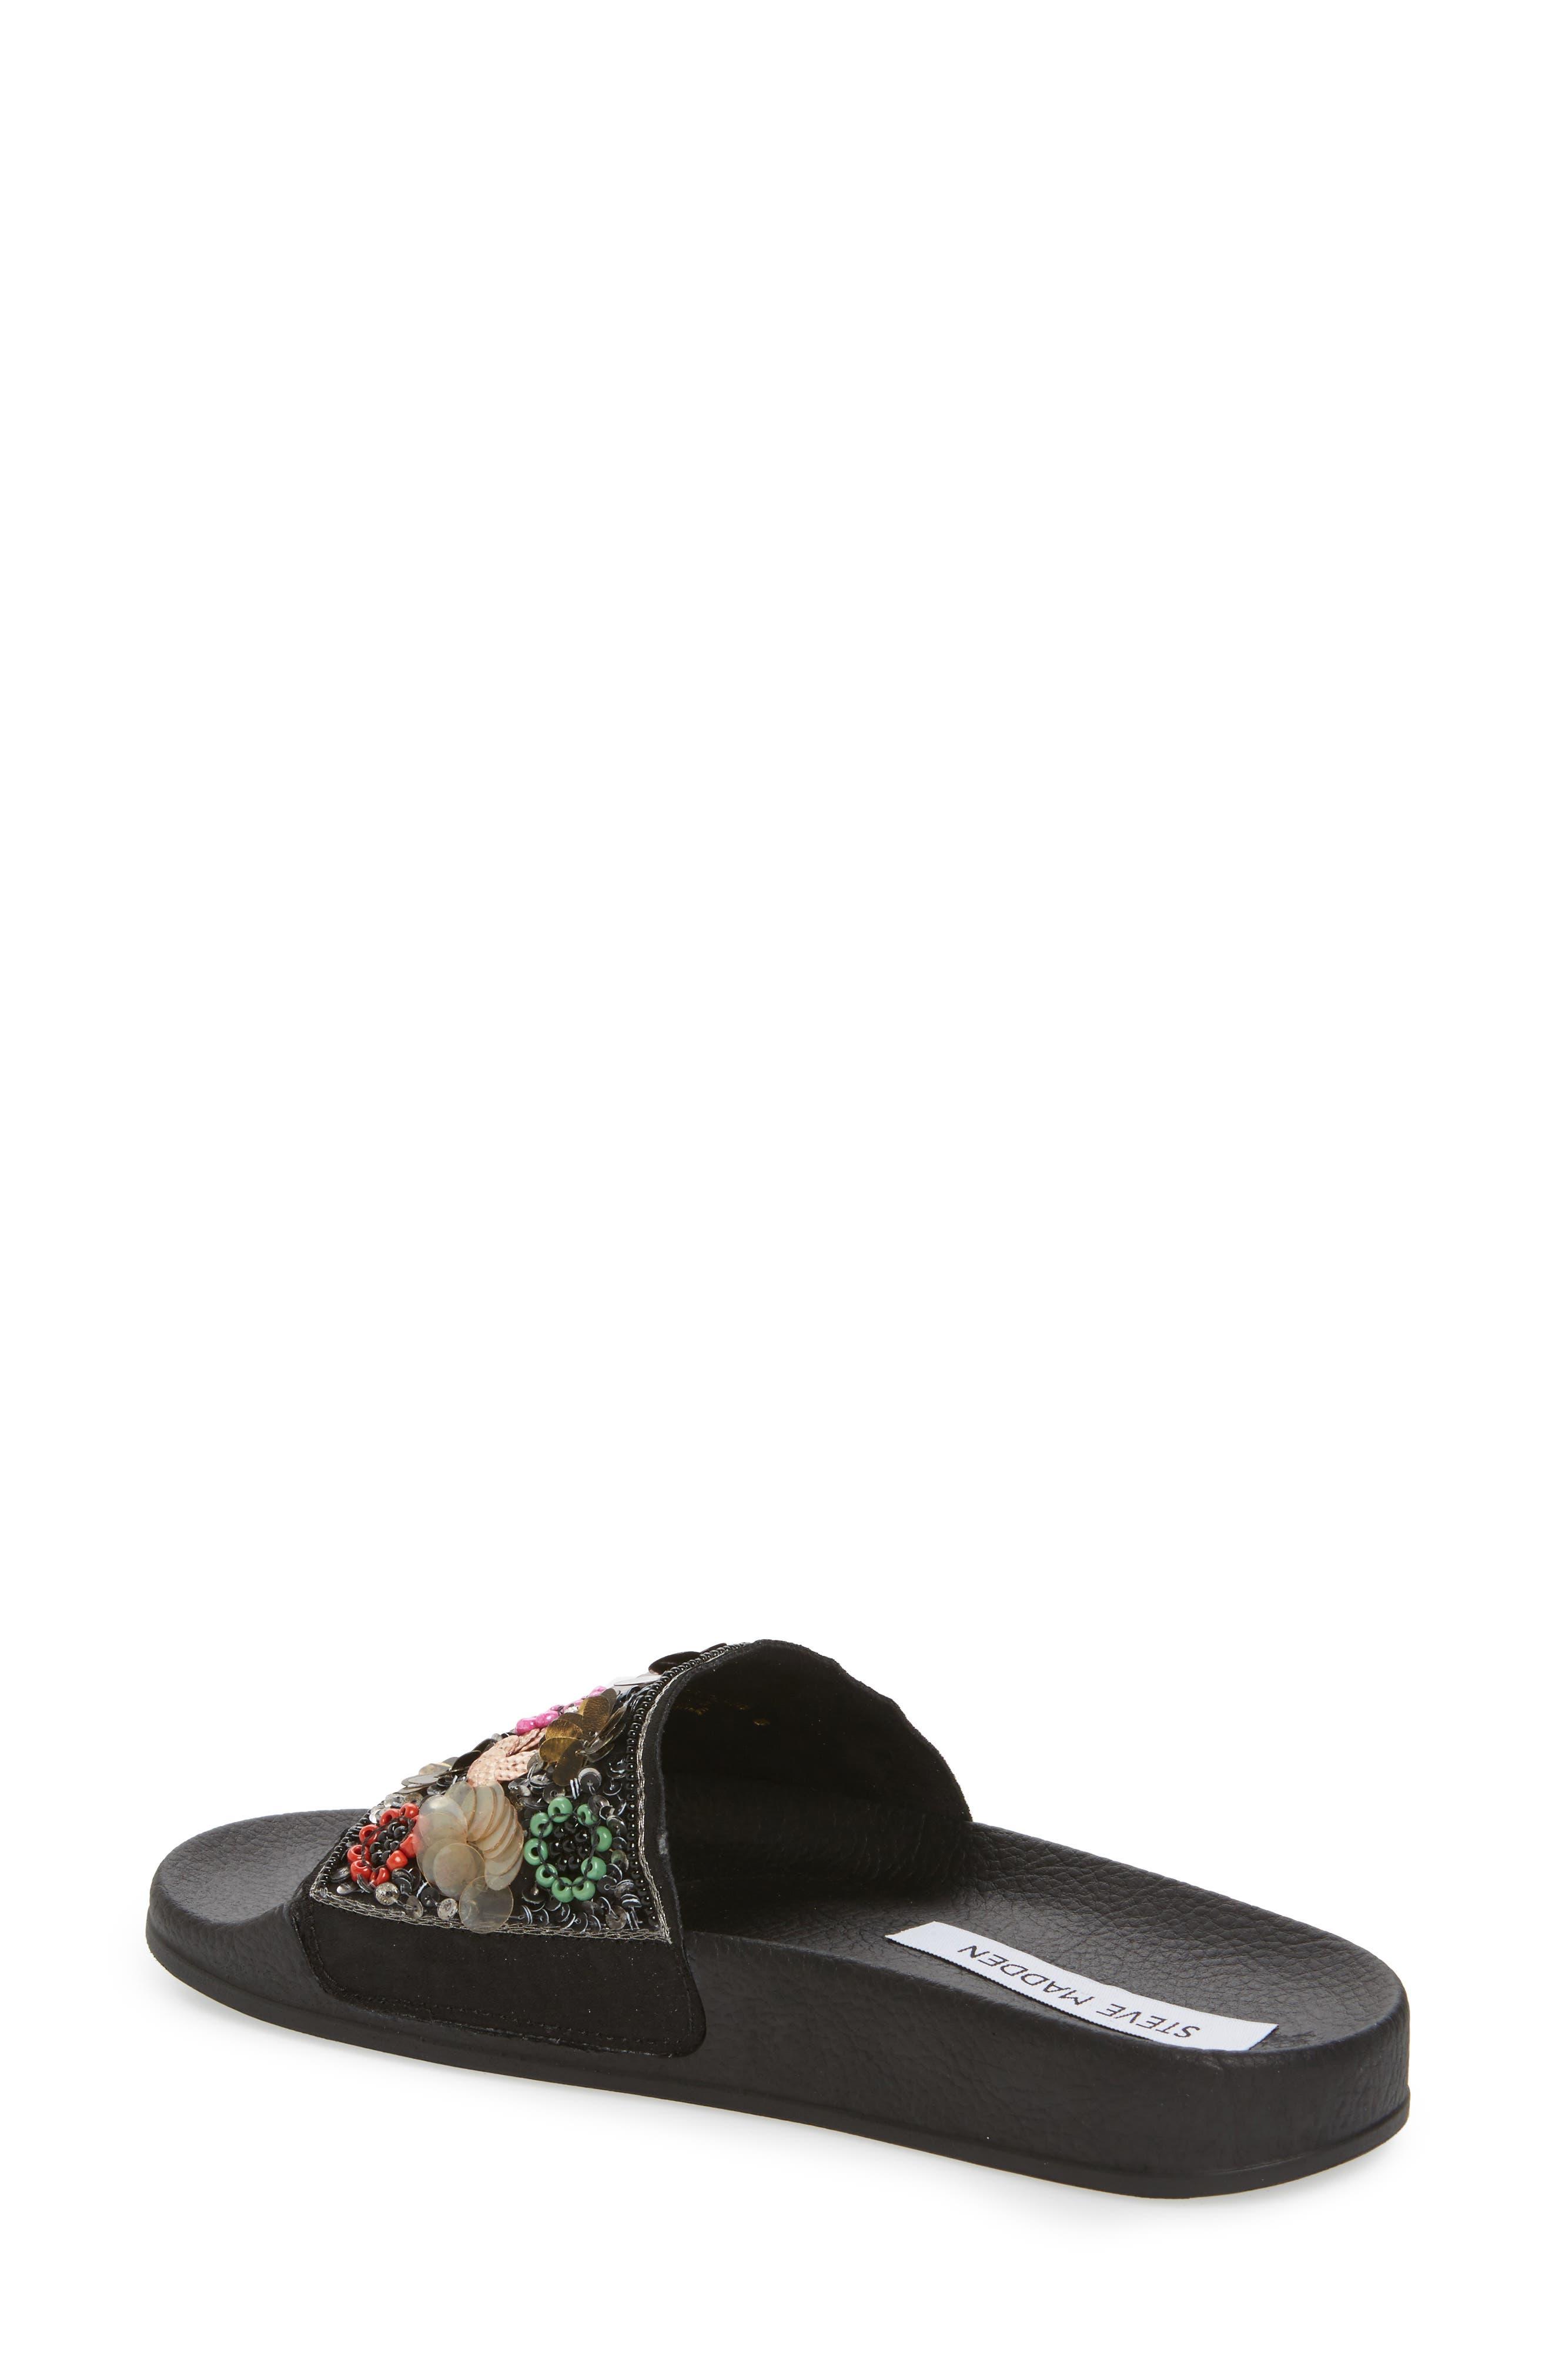 Maddy Embellished Slide Sandal,                             Alternate thumbnail 2, color,                             Flower Multi